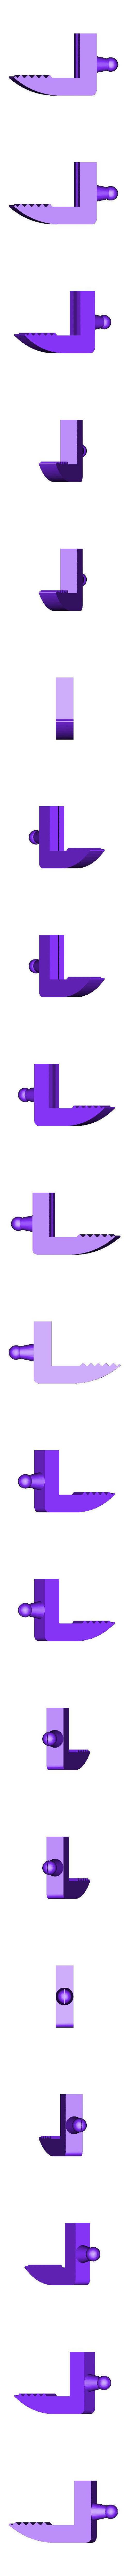 Croc_clamp_15mm.STL Download STL file Crocodile Vise Clamps (attachment for Solder Helper Hands) • 3D printing design, benspawn